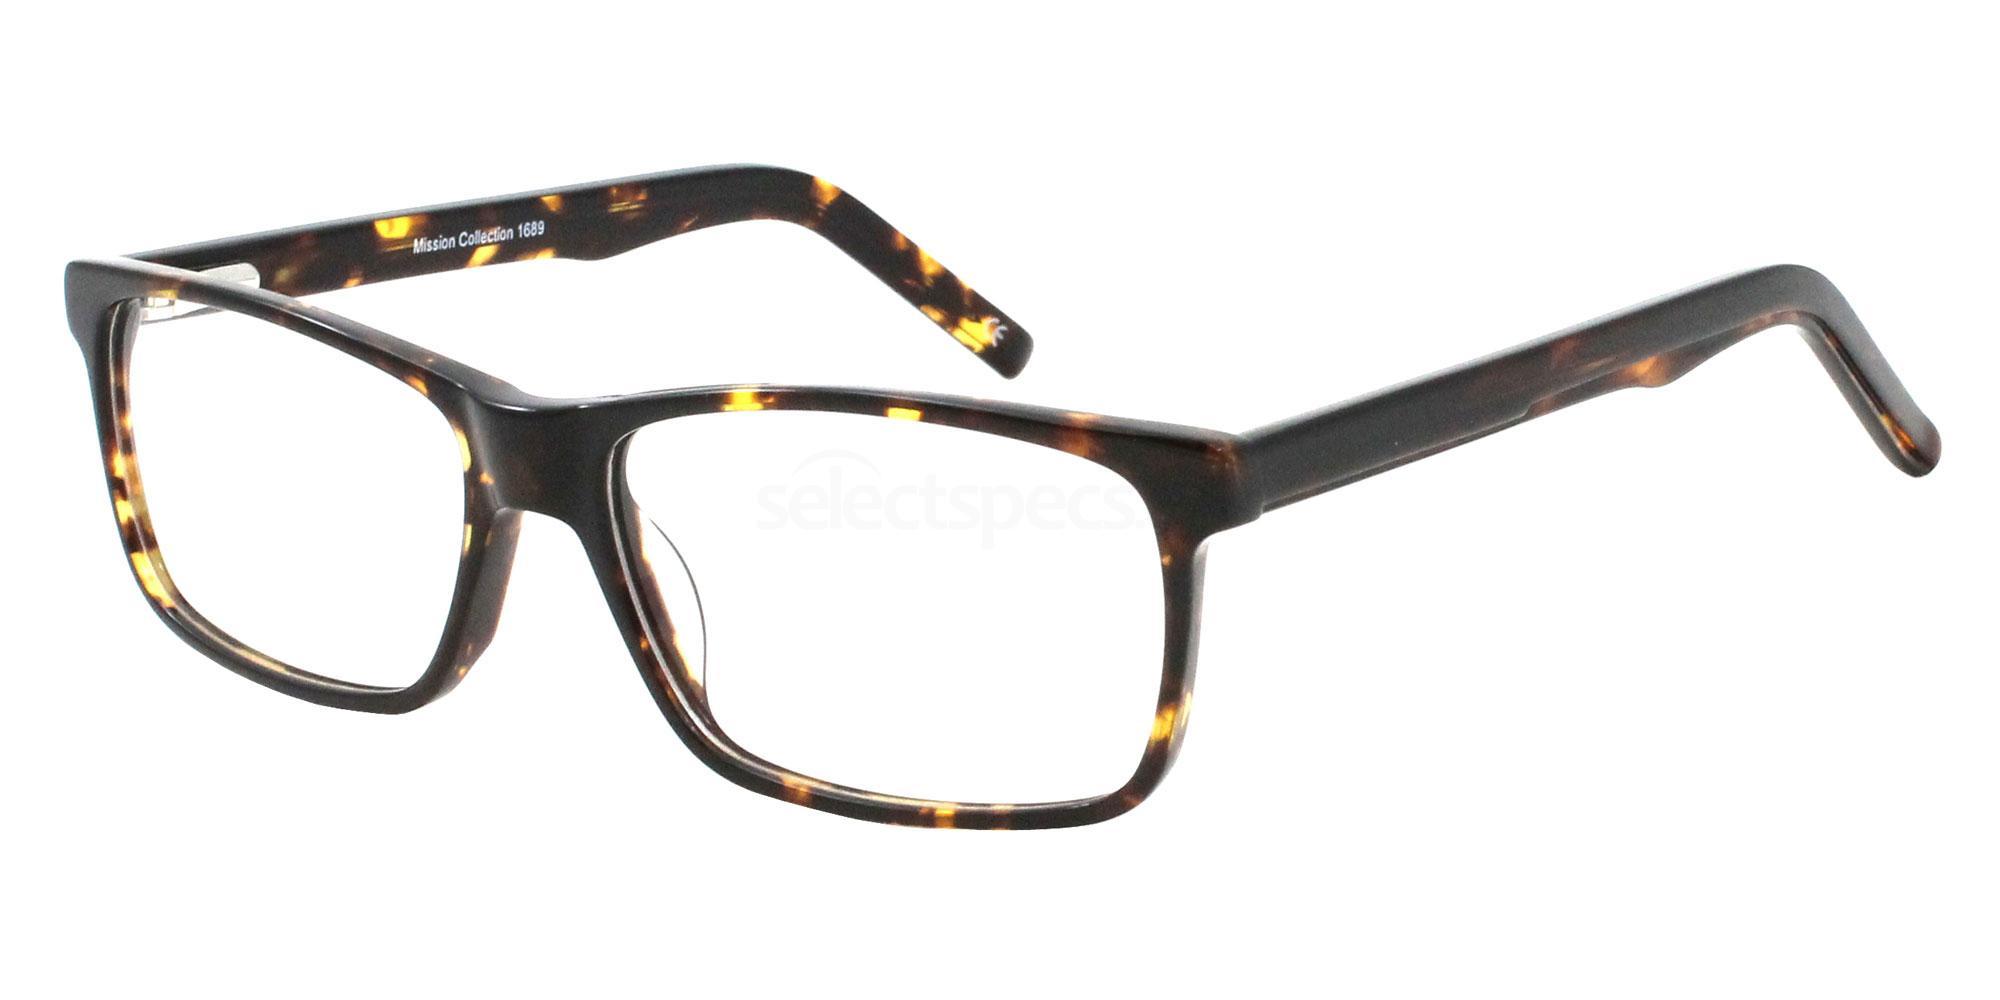 02 1689 Glasses, Mission